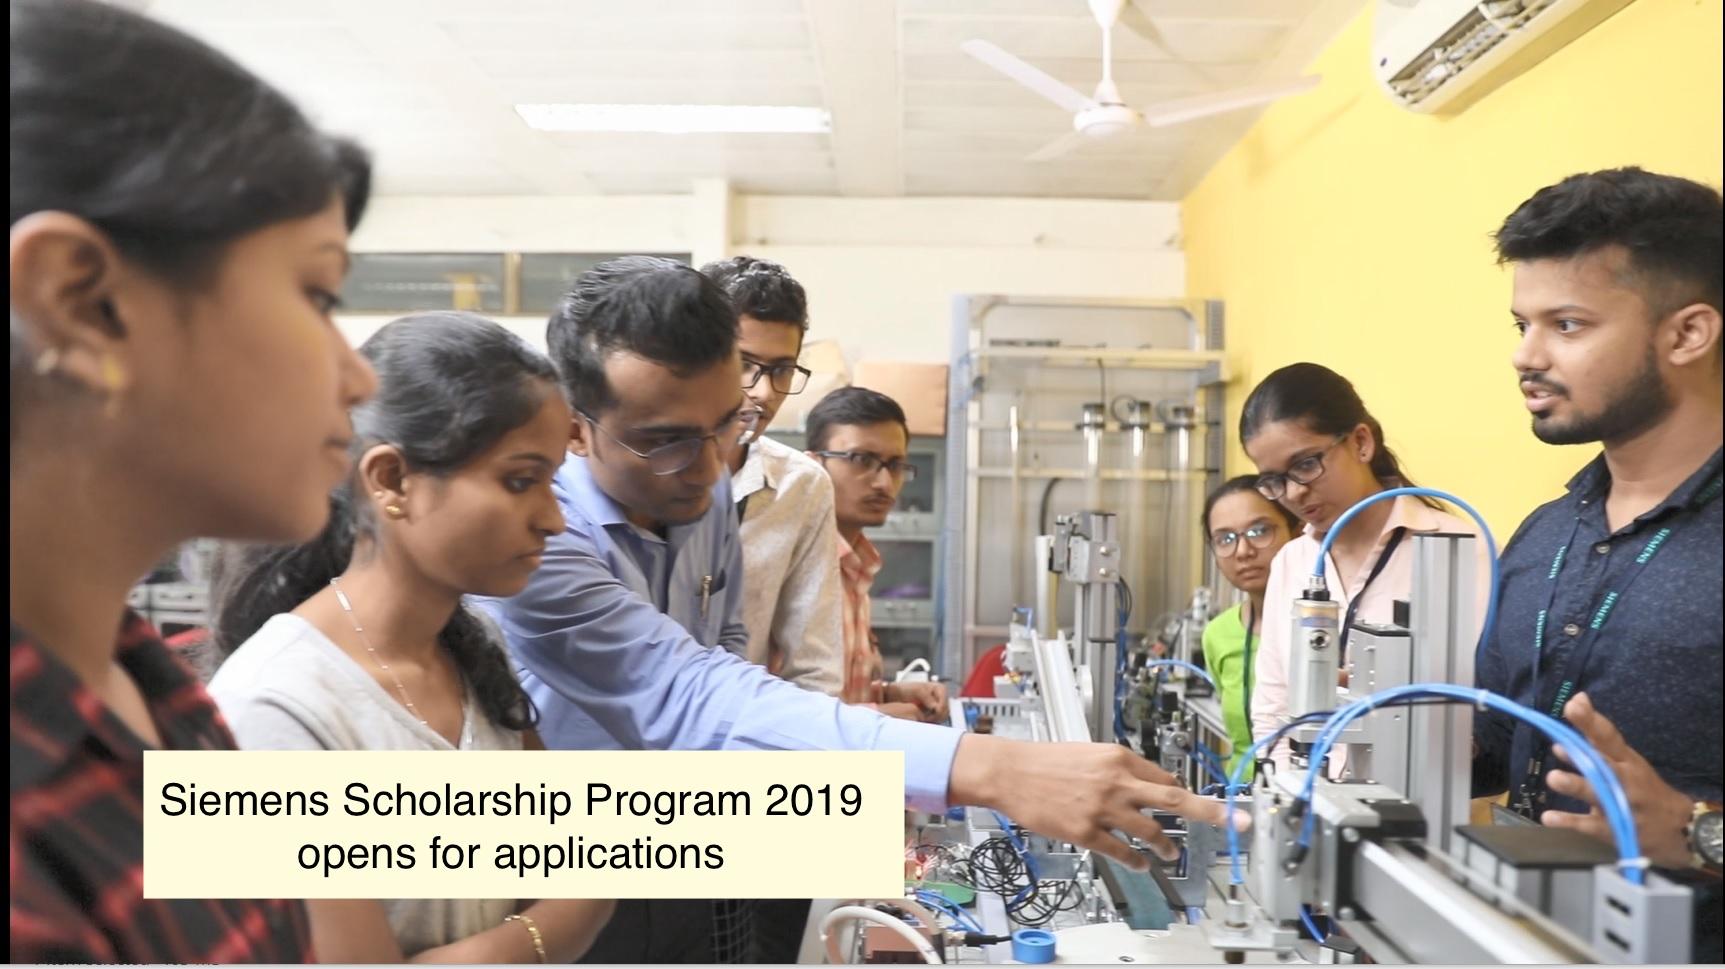 Siemens Scholarship Program 2019